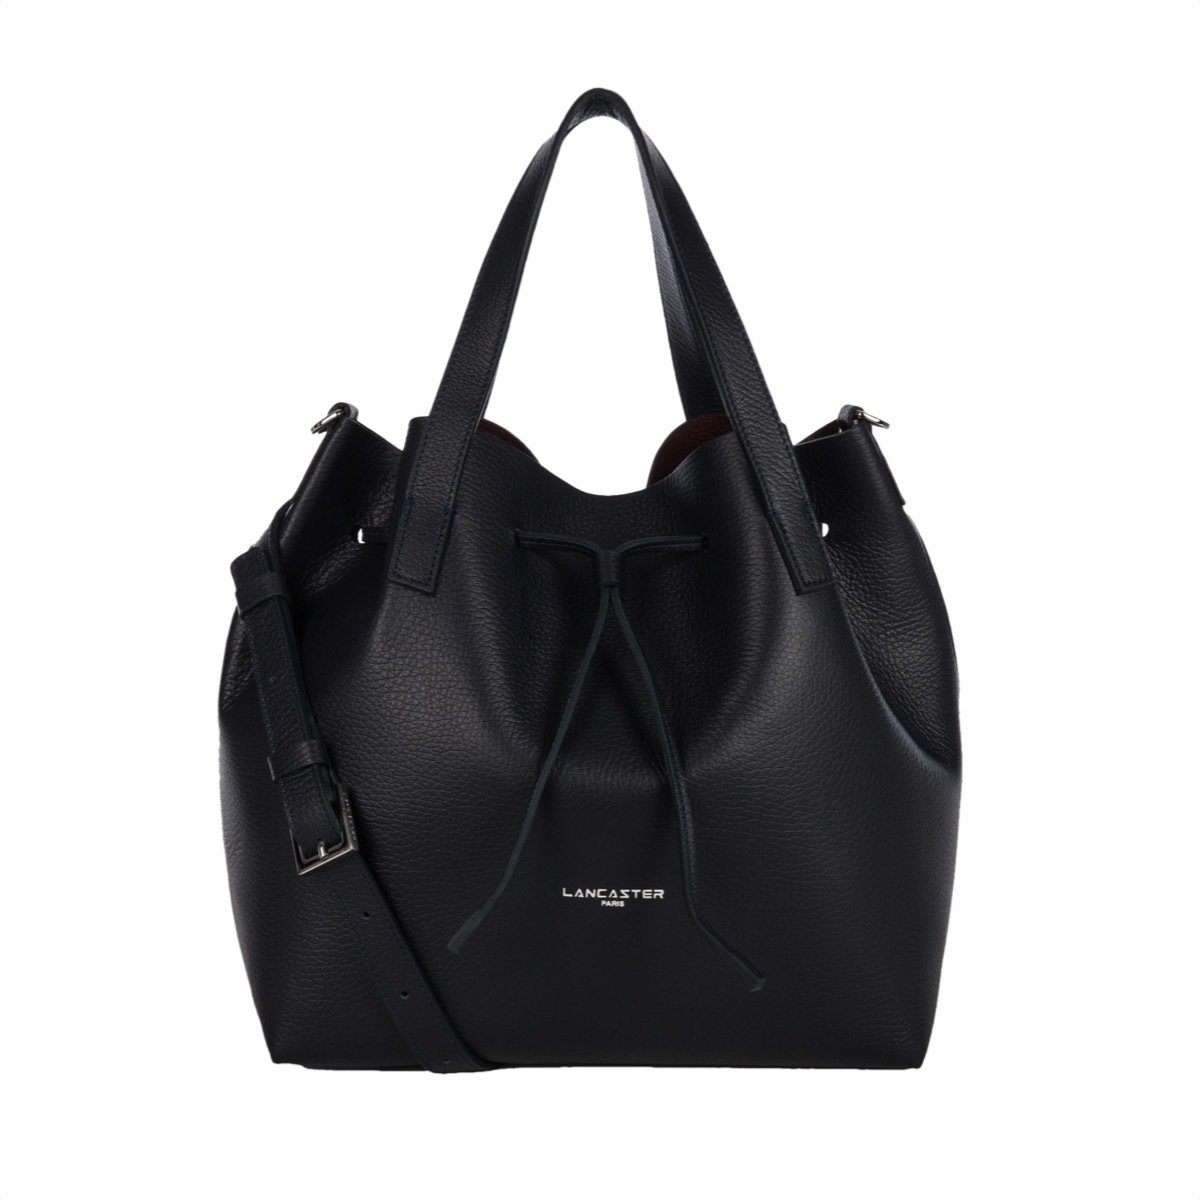 LANCASTER - Large Bucket Bag - Bleu Fonce in Bordeaux